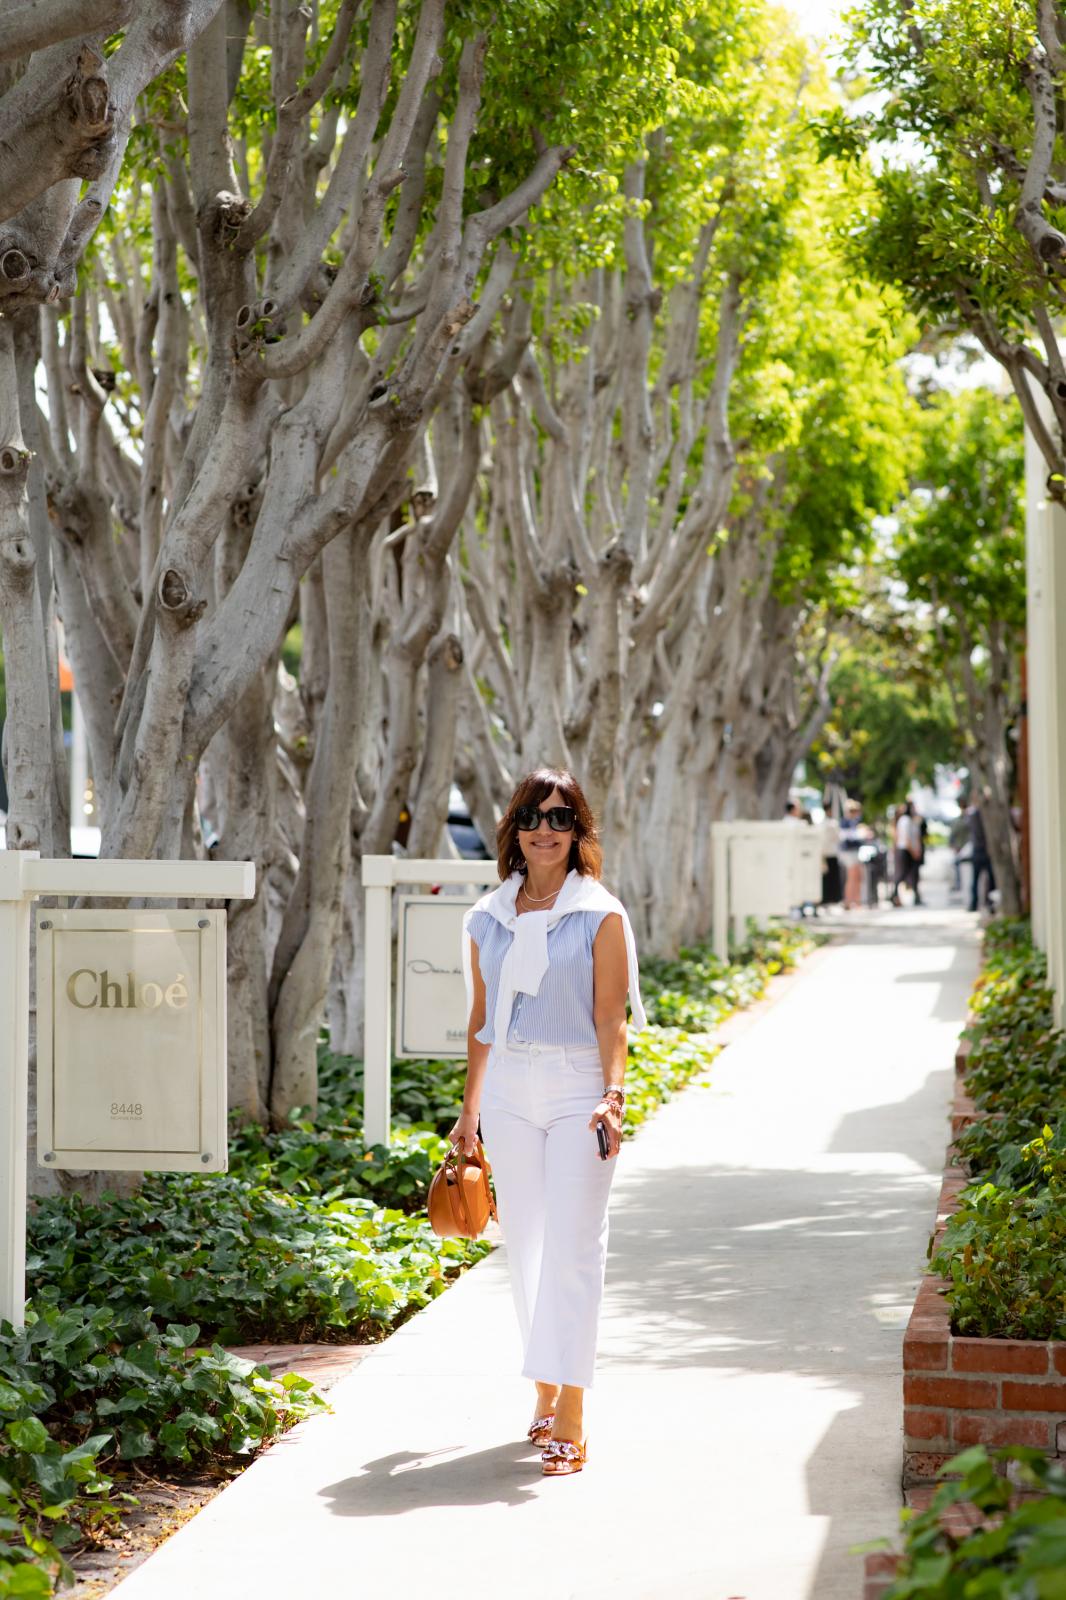 Blouse, white denim, summer sandals, summer style 2021, gucci singlasses, chloe handbag